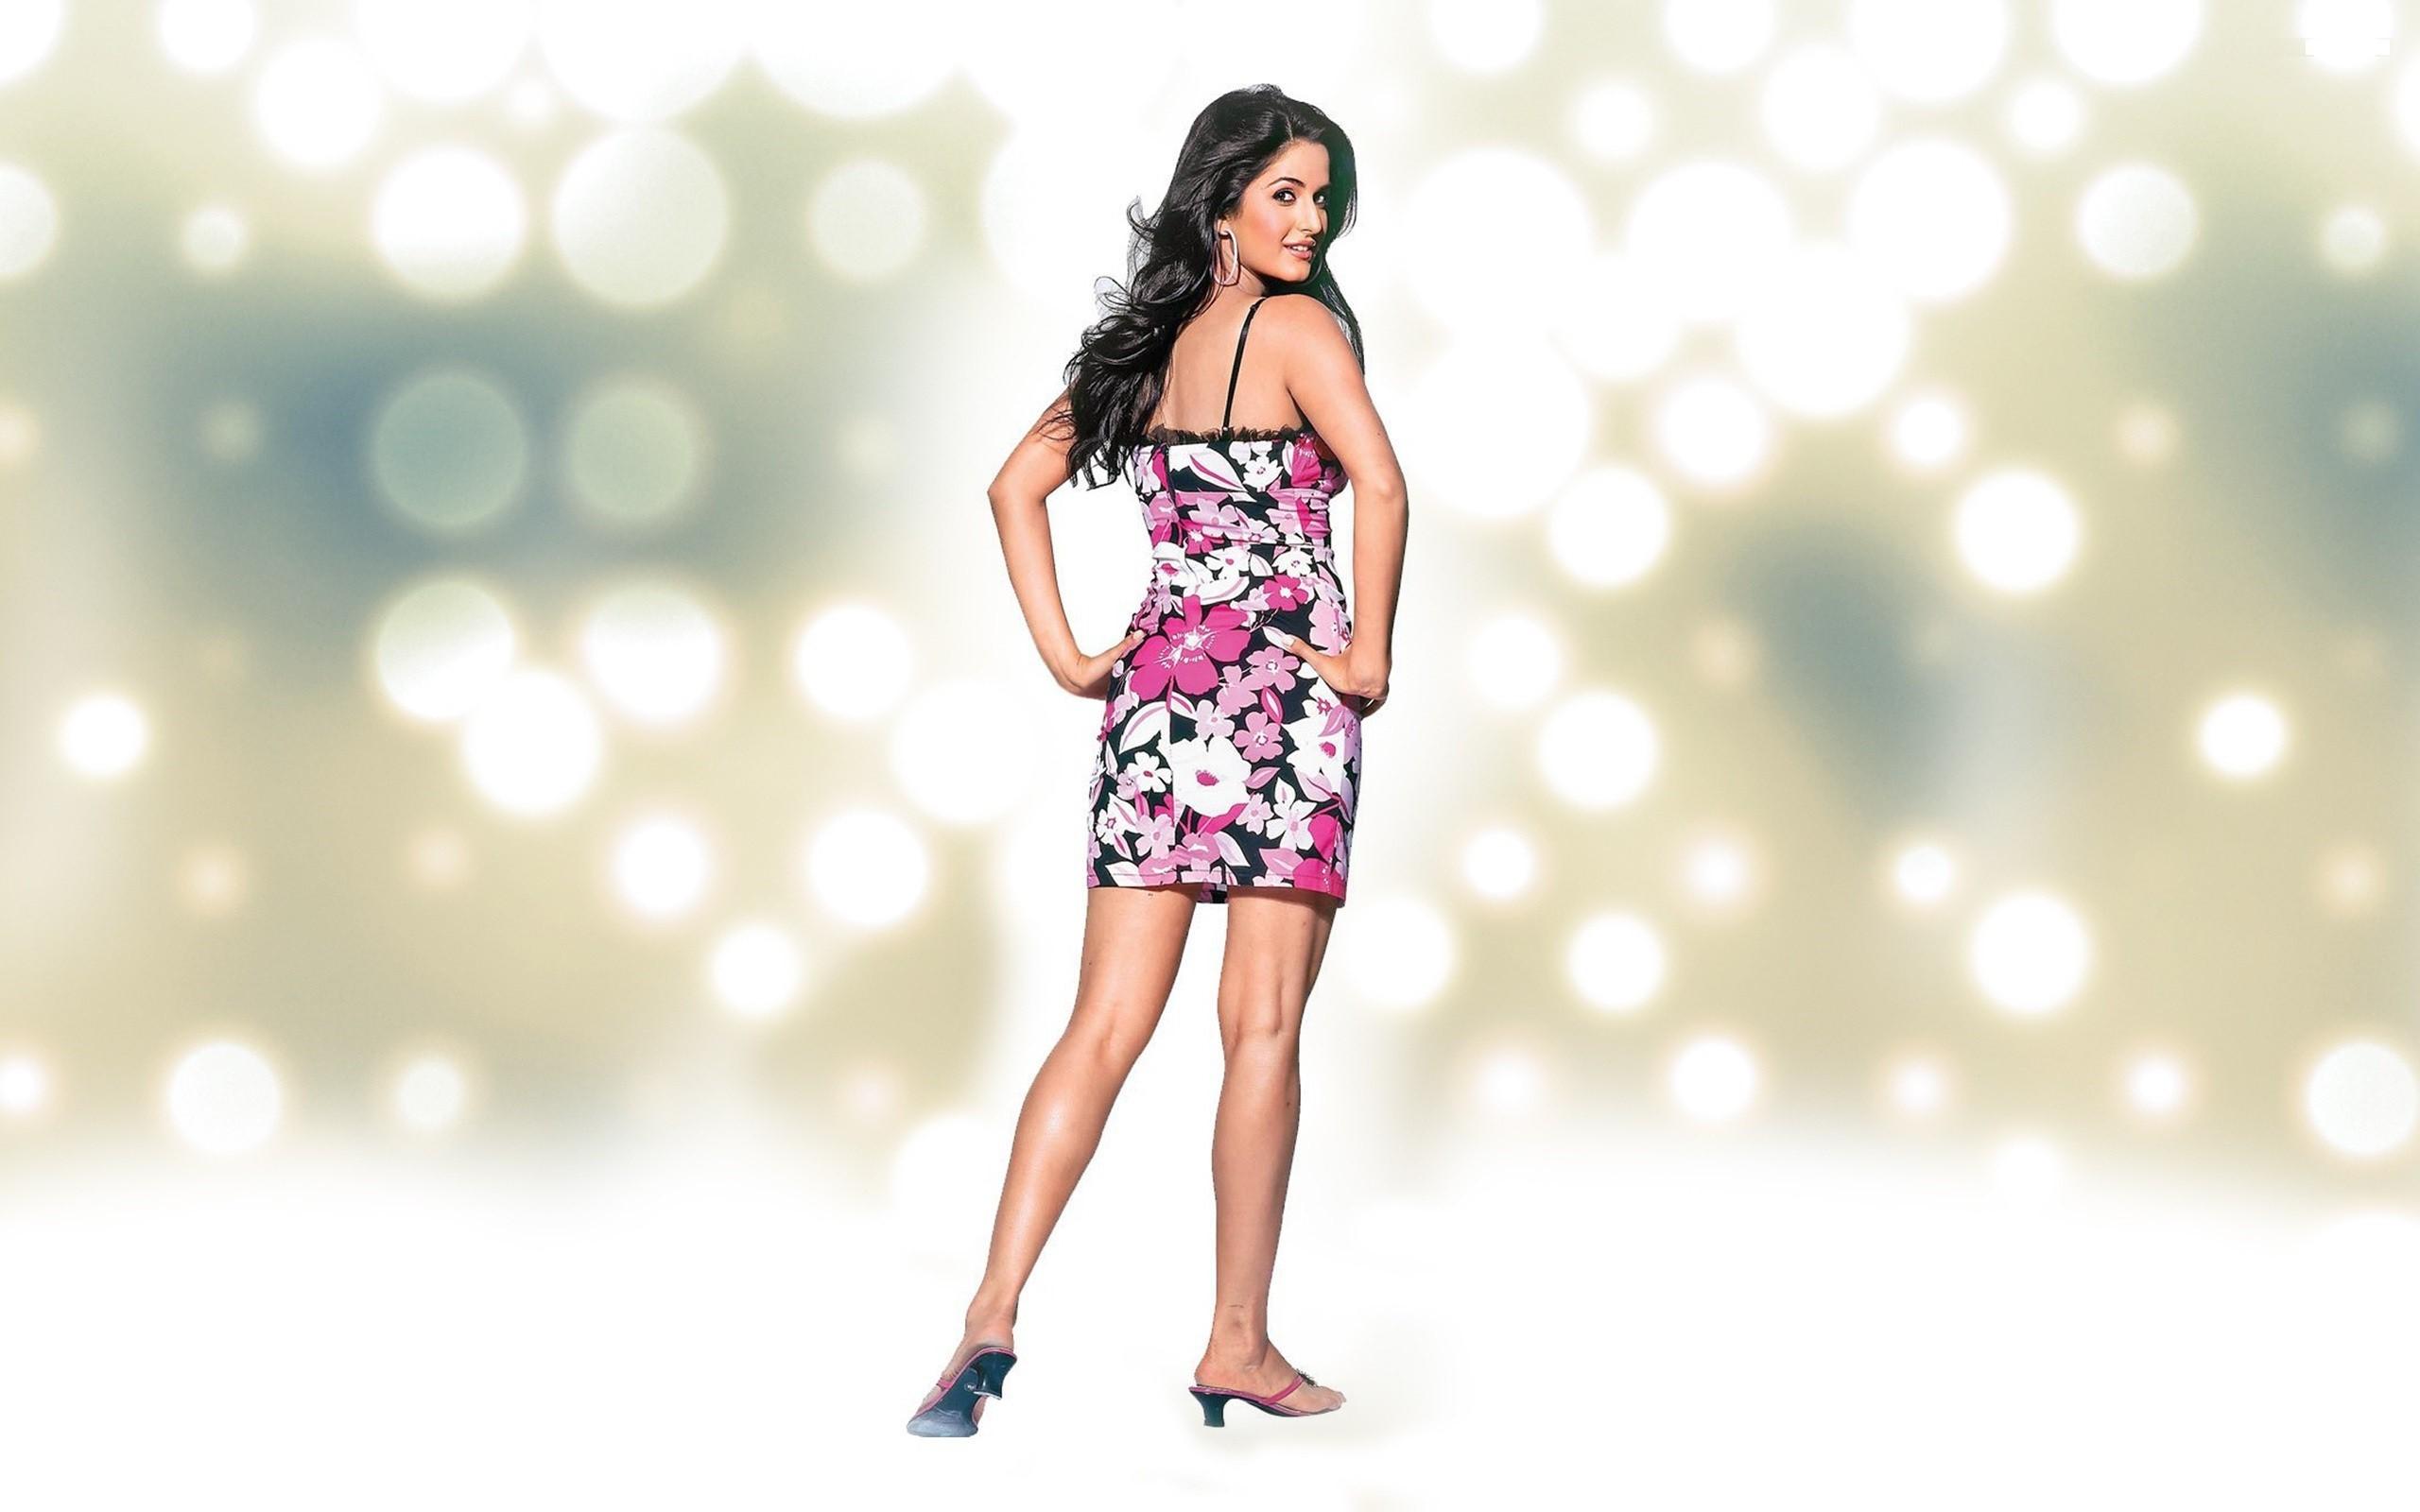 Actress Katrina Kaif Stylist Standing and Looking Back Pose HD Wallpaper